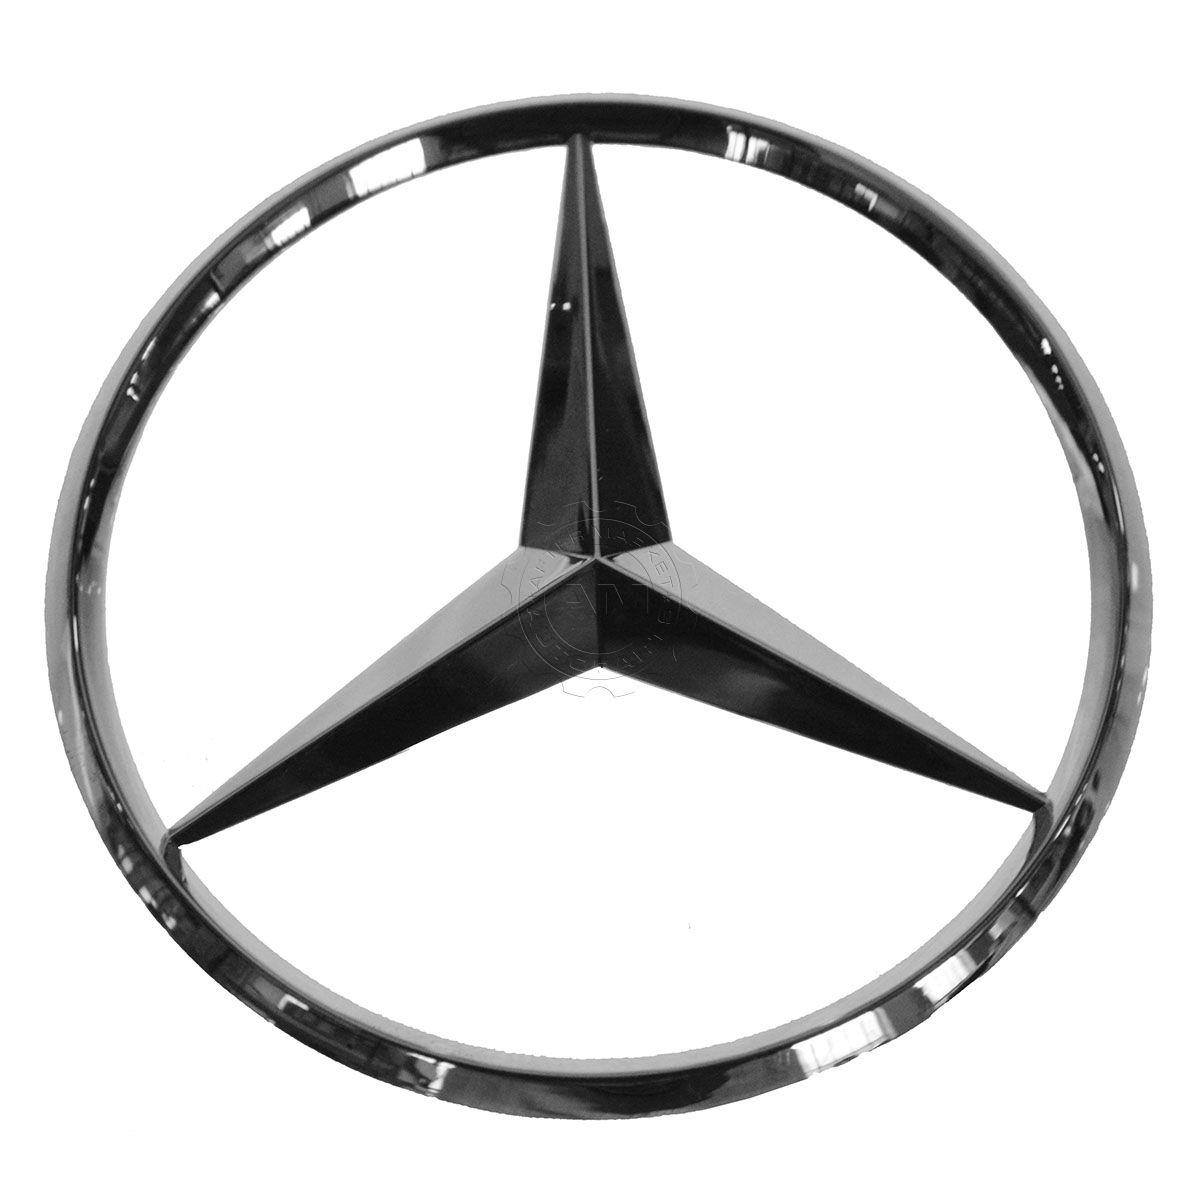 Oem trunk emblem badge chrome for mercedes benz ebay for Mercedes benz oem replacement parts